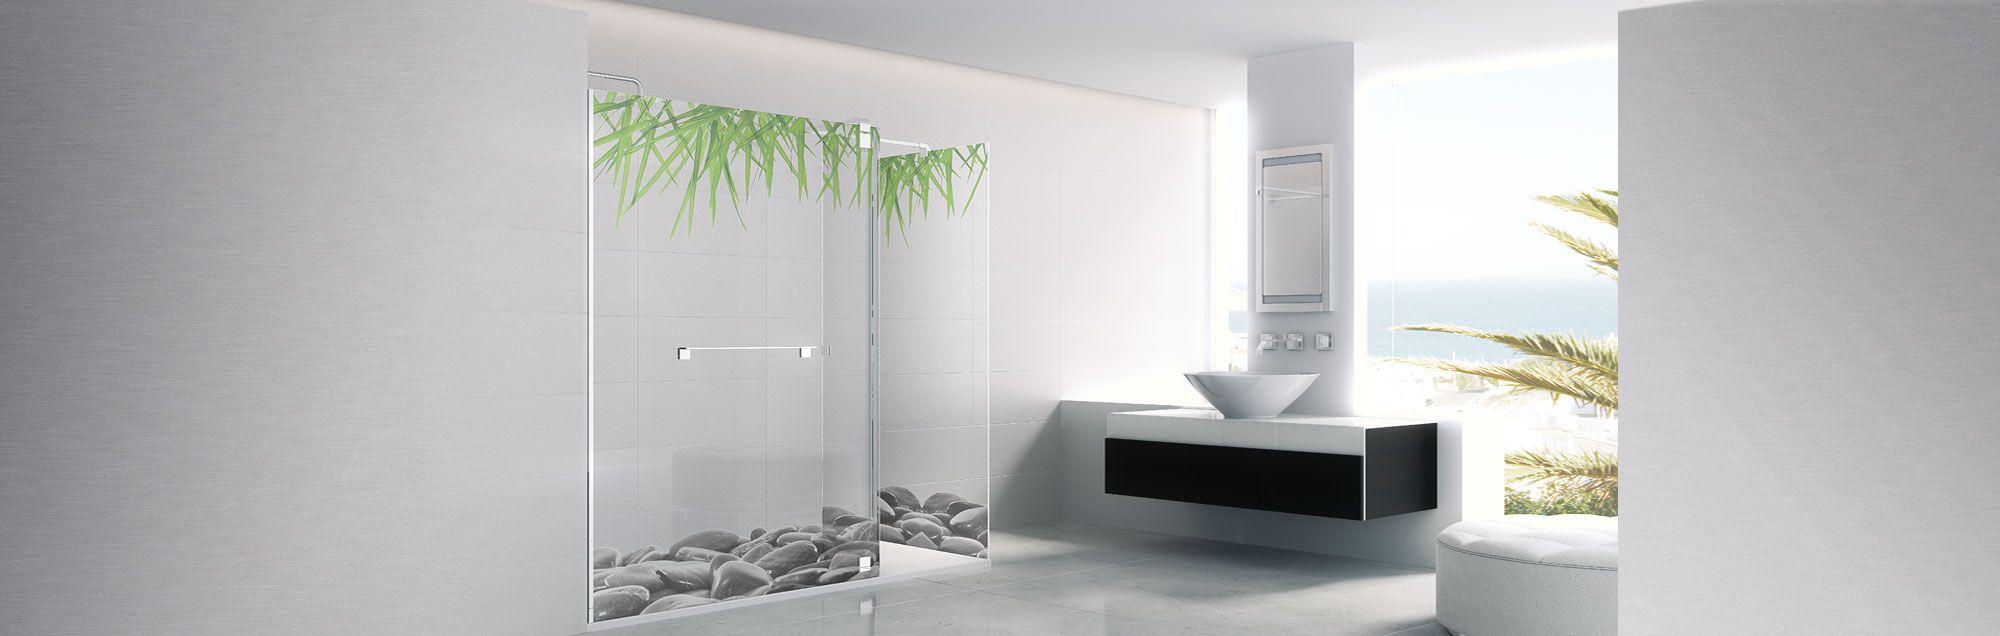 Serie Belus de mamparas walk-in de baño a medida